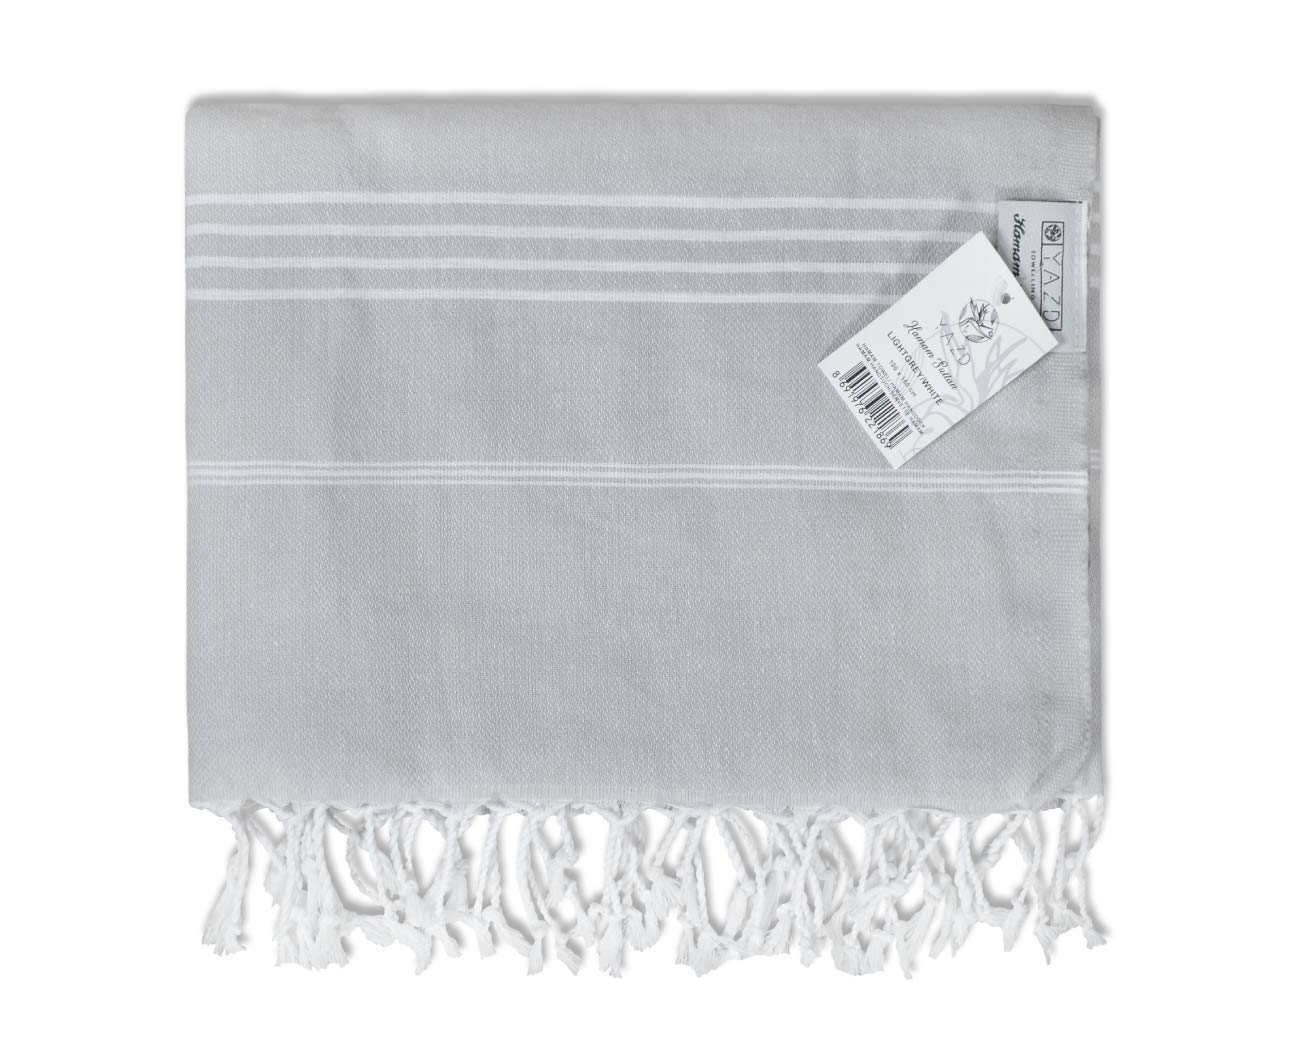 ultra absorbent Traditional Peshtemal Design Turkish hamam towels lightweight soft cotton travel towels antibacterial quick dry